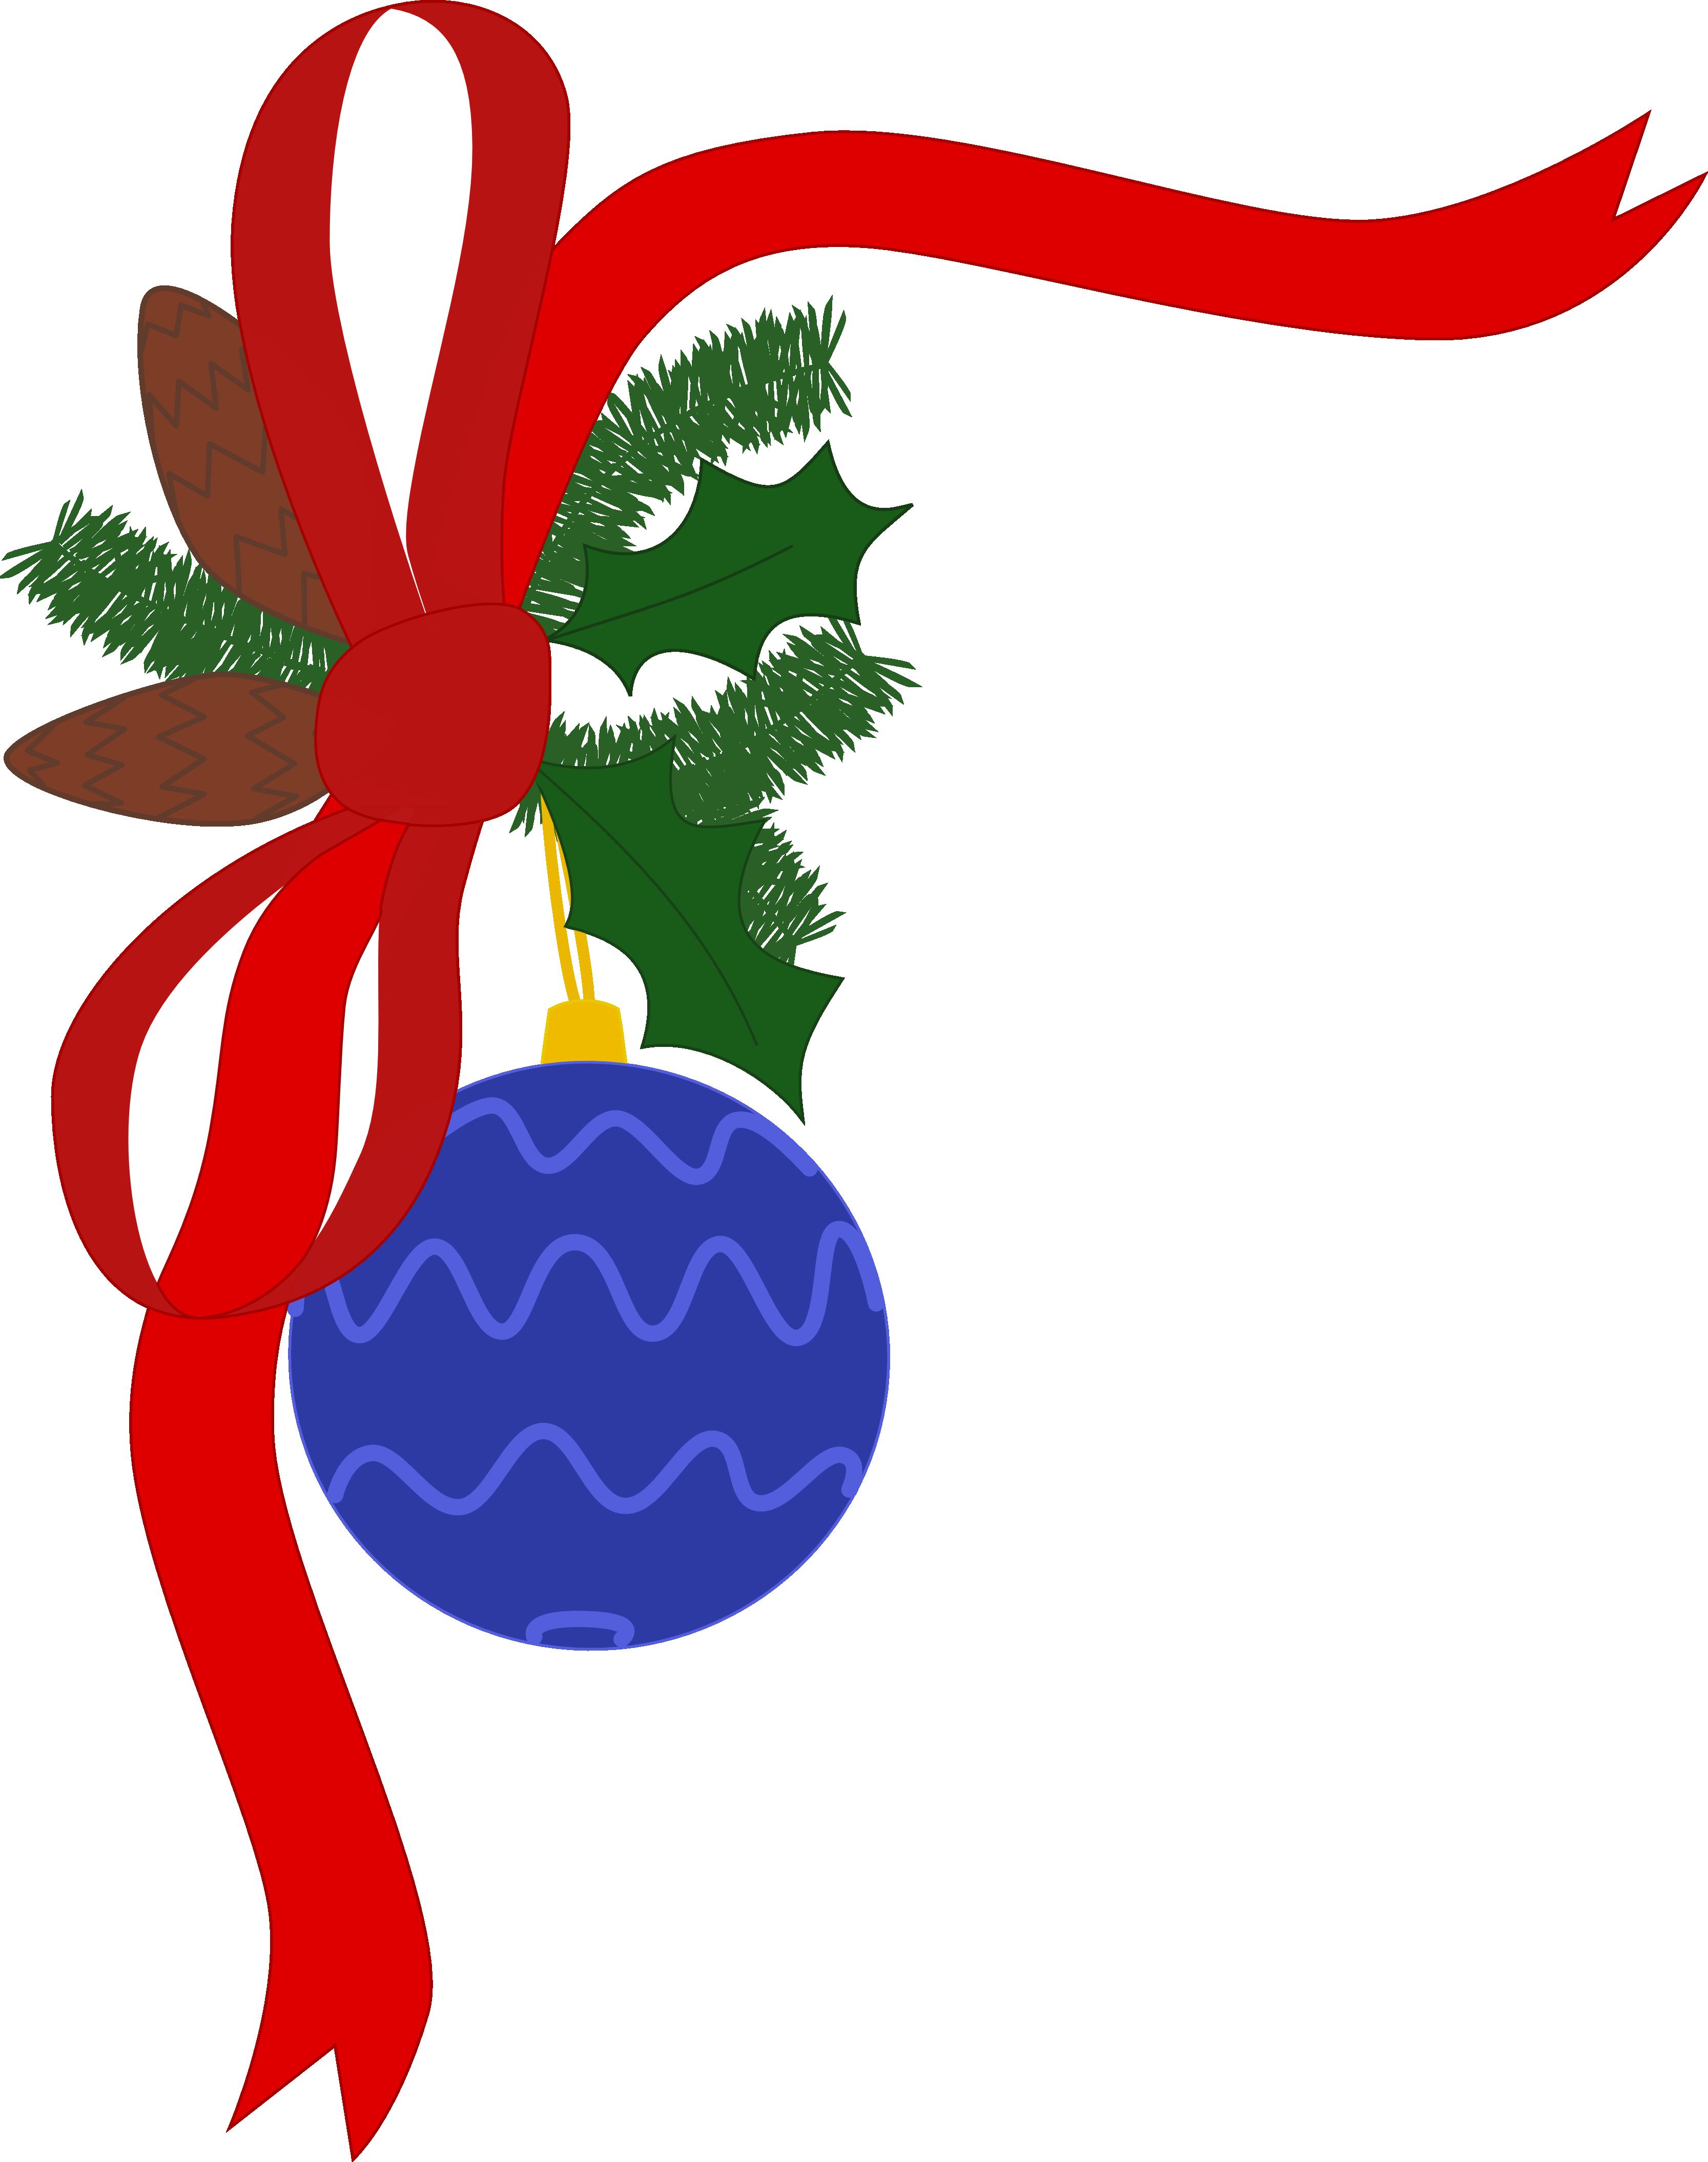 Christmas Symbols Clip Art - ClipArt Best